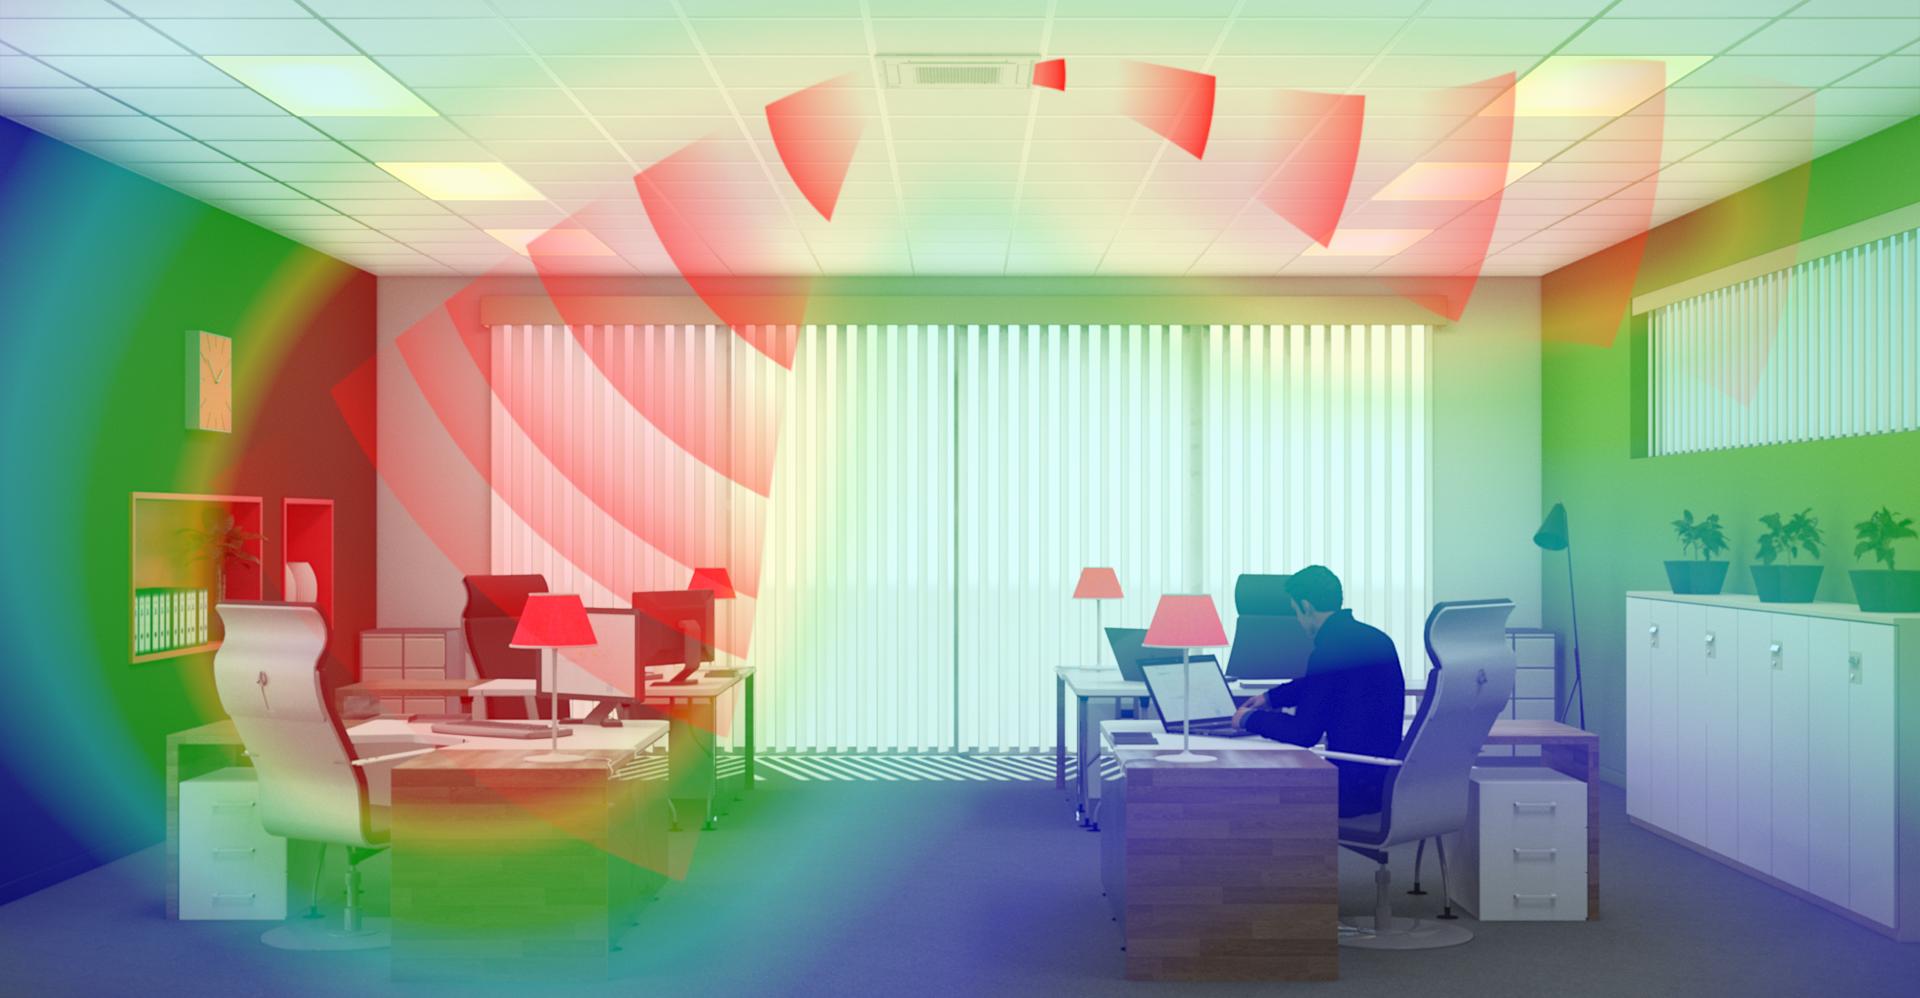 Lightbox sensordriven new pic